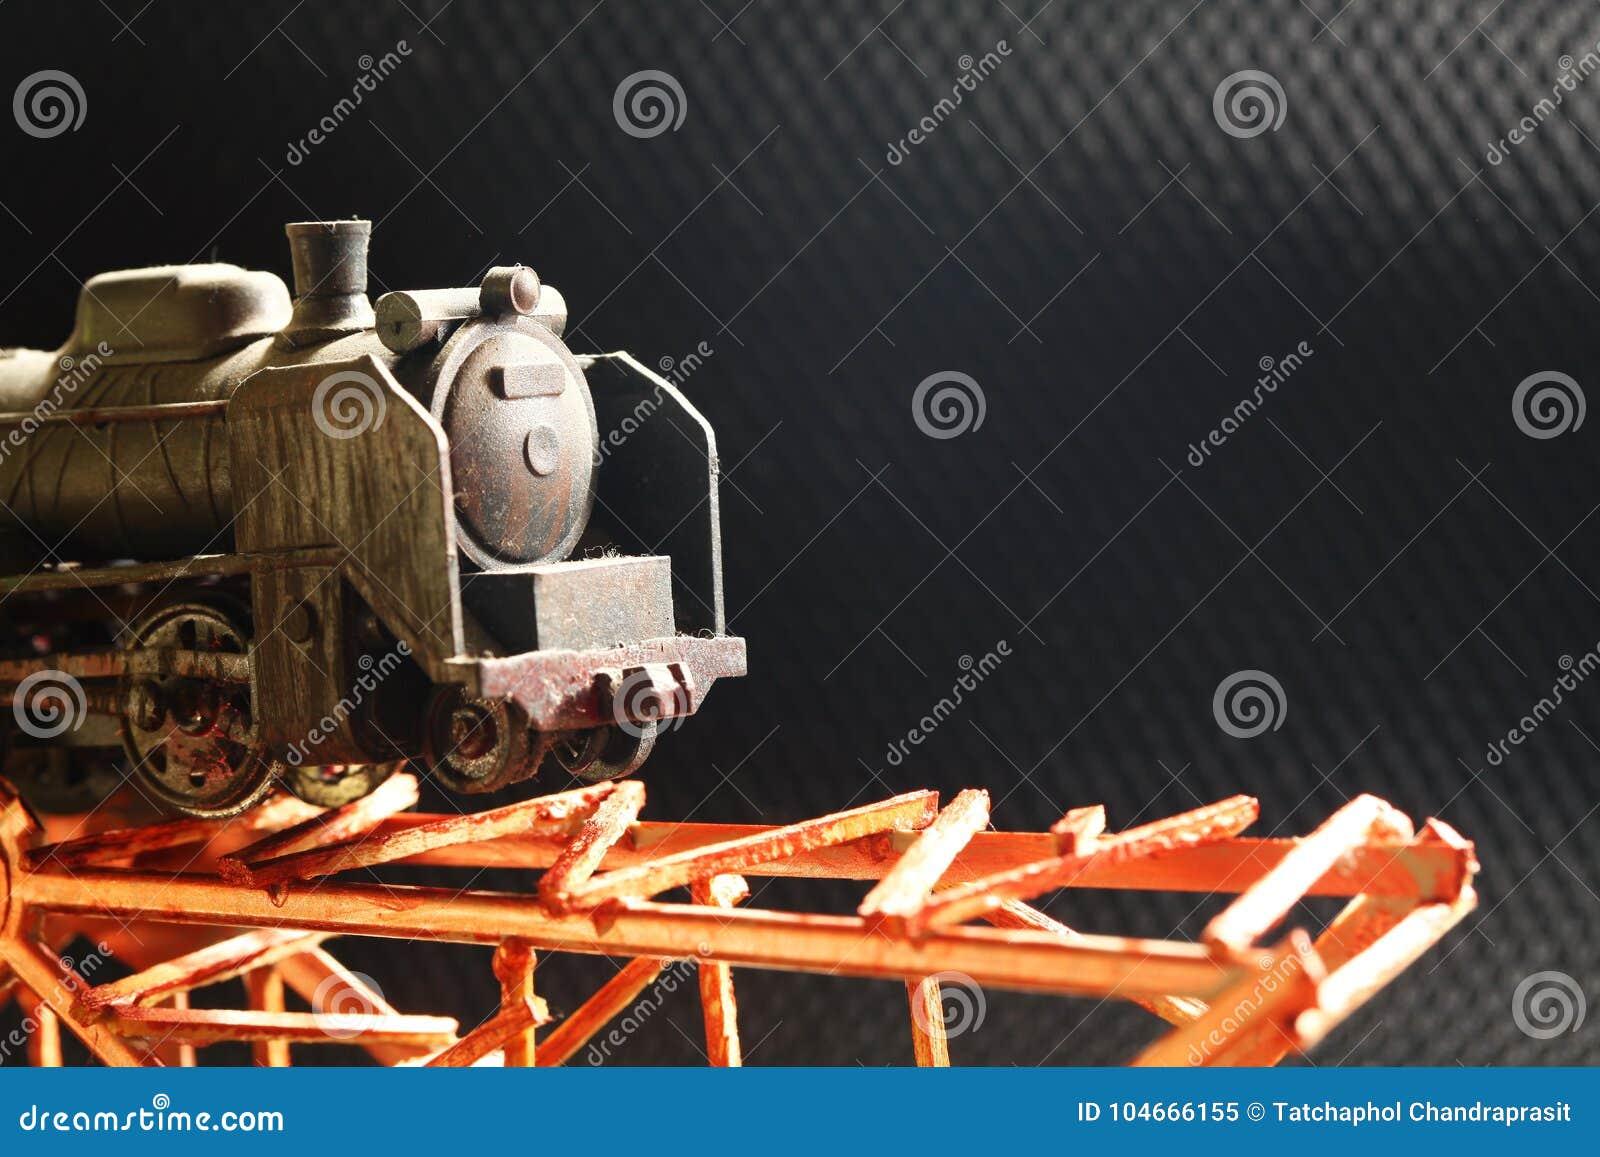 The miniature plastic model railroad on bridge.